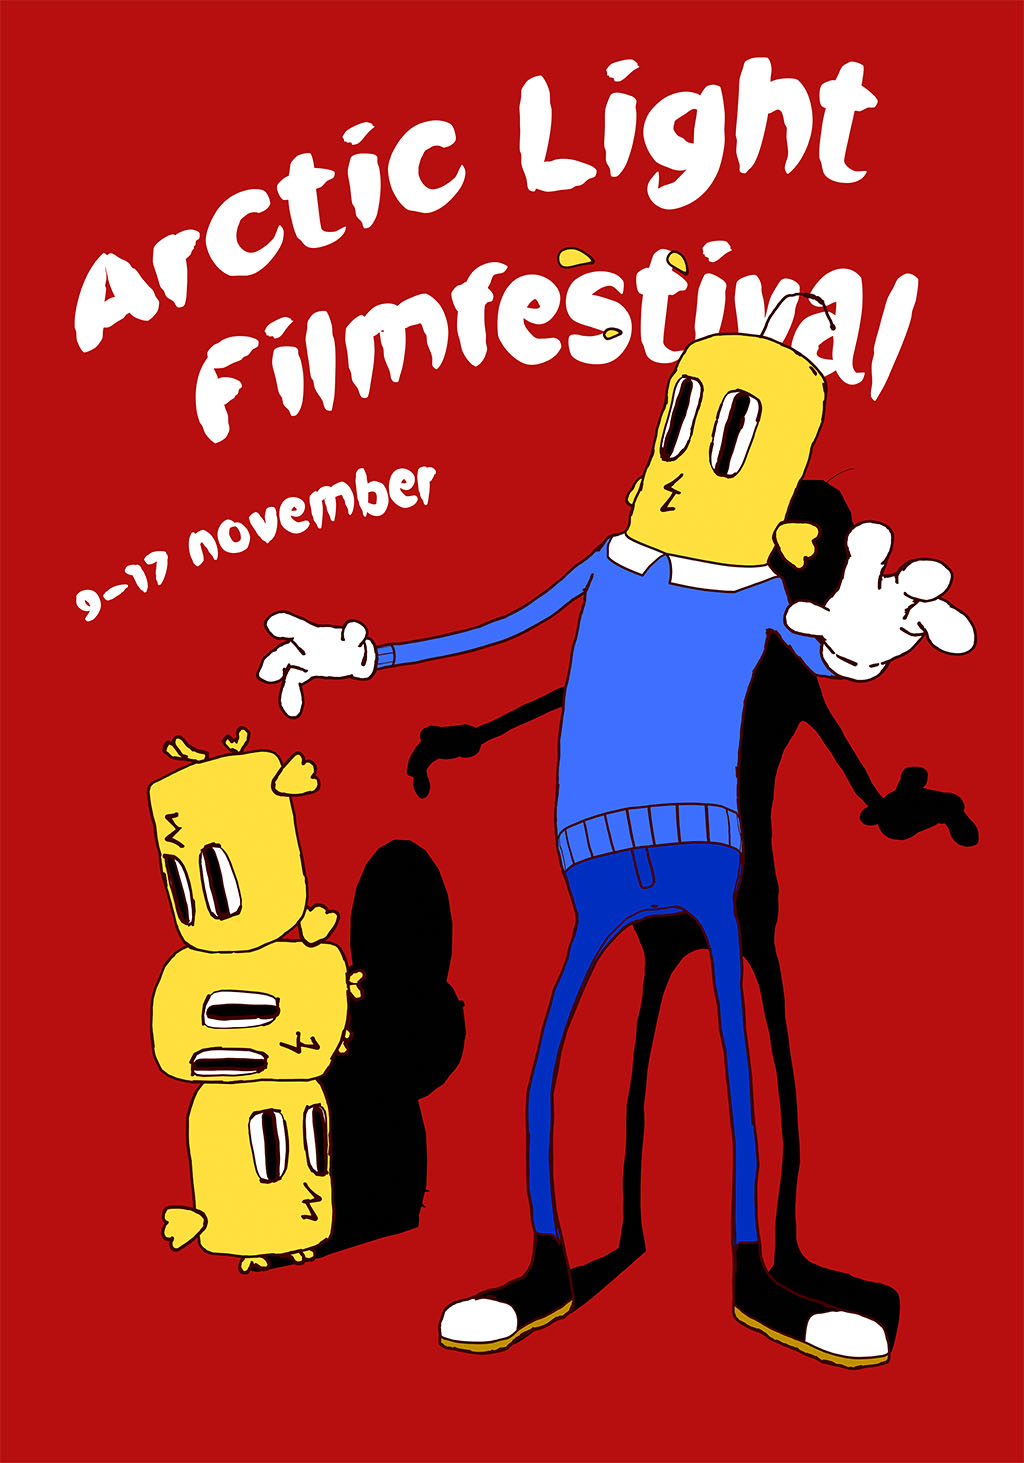 Arctic light film festival 2018 poster